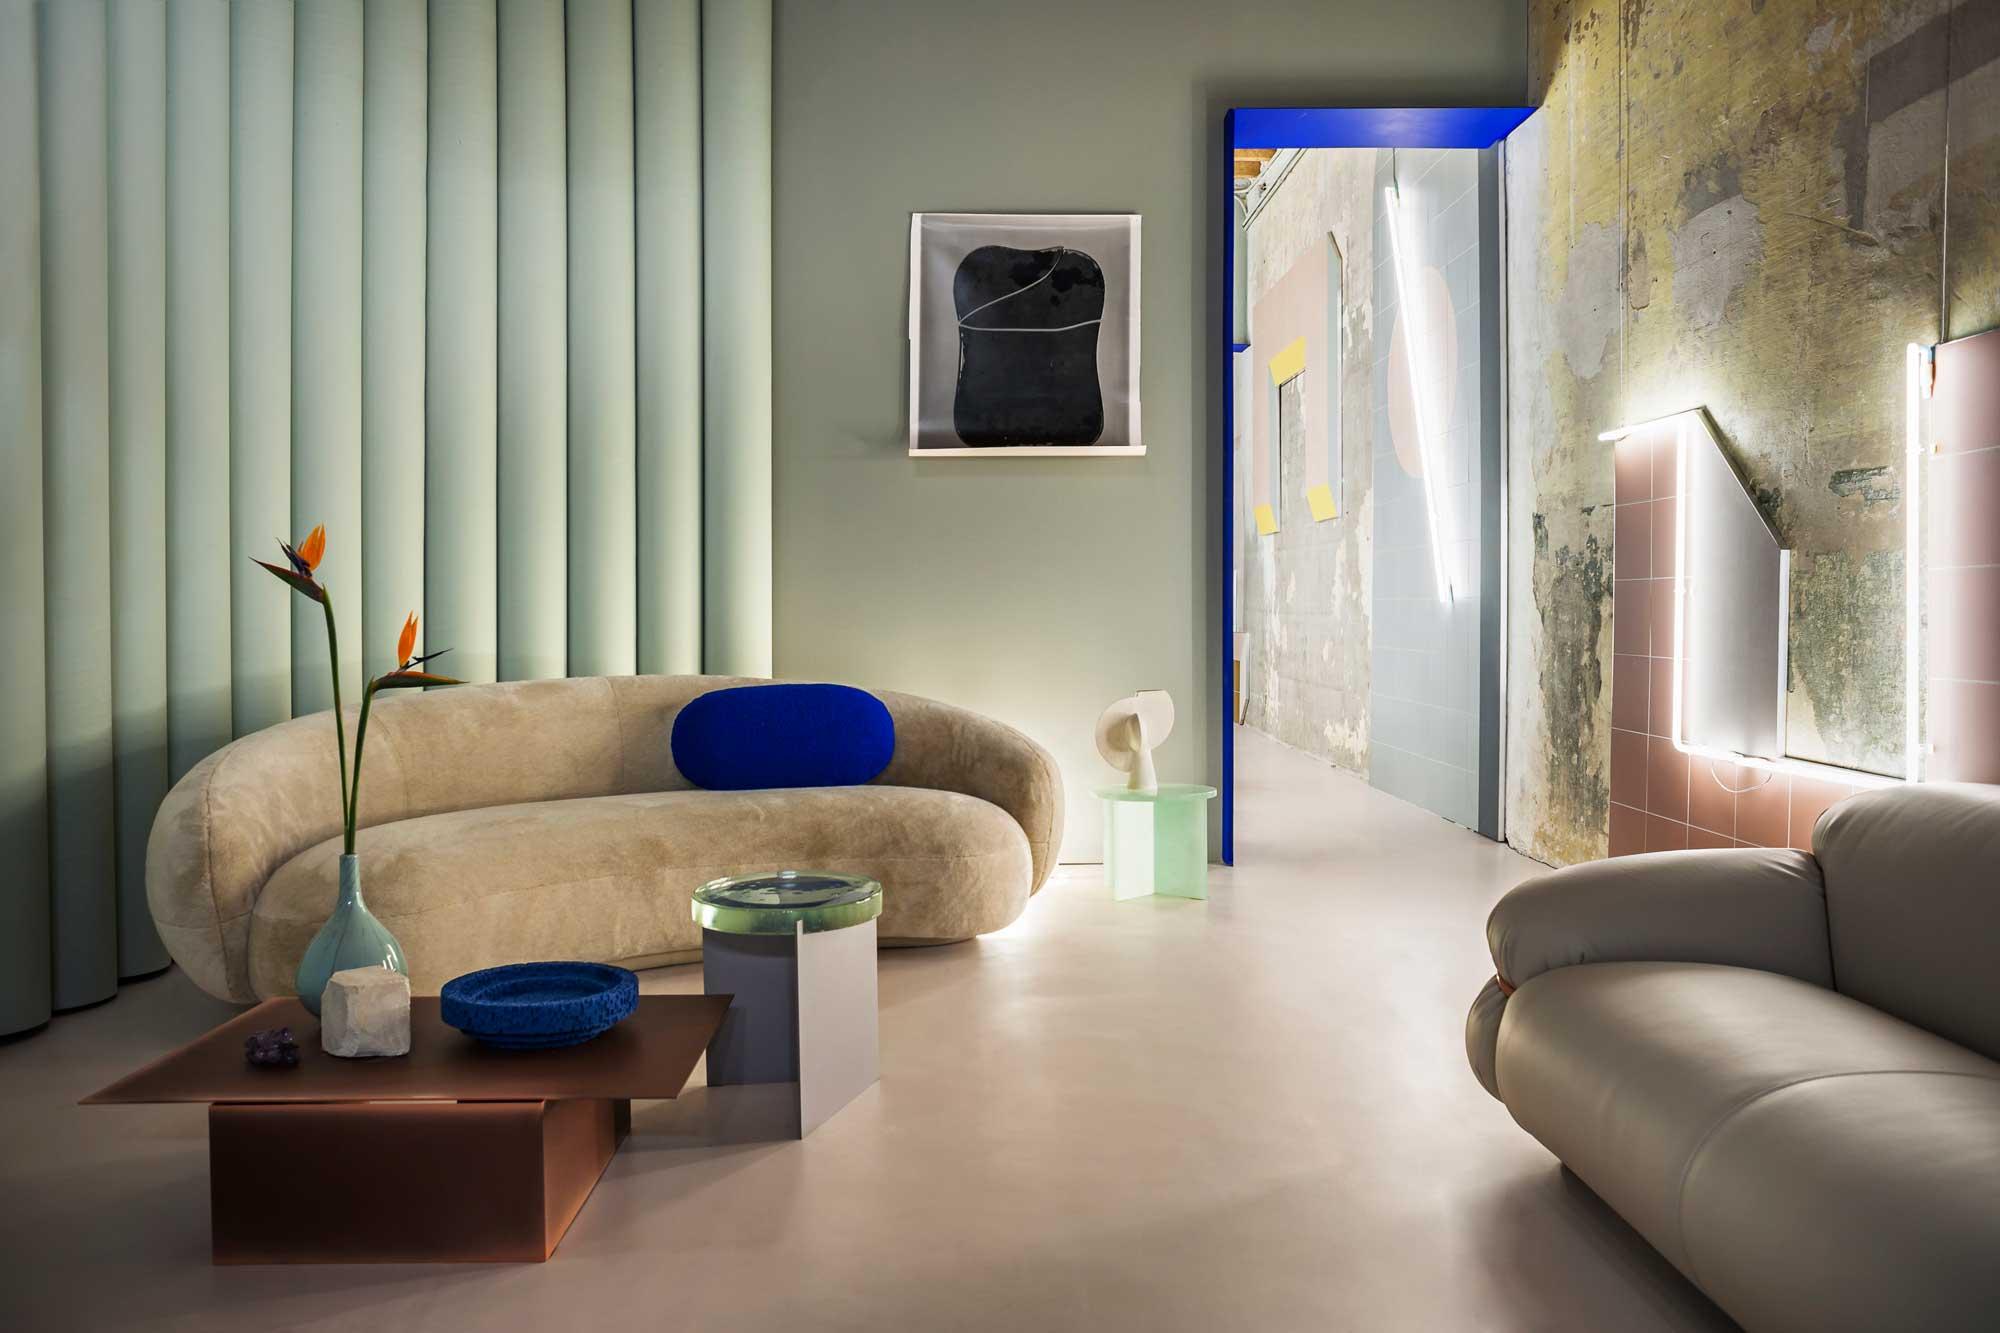 10 Italian Interior Designers You Need To Know italian interior designer 10 Italian Interior Designers You Need To Know studio pepe